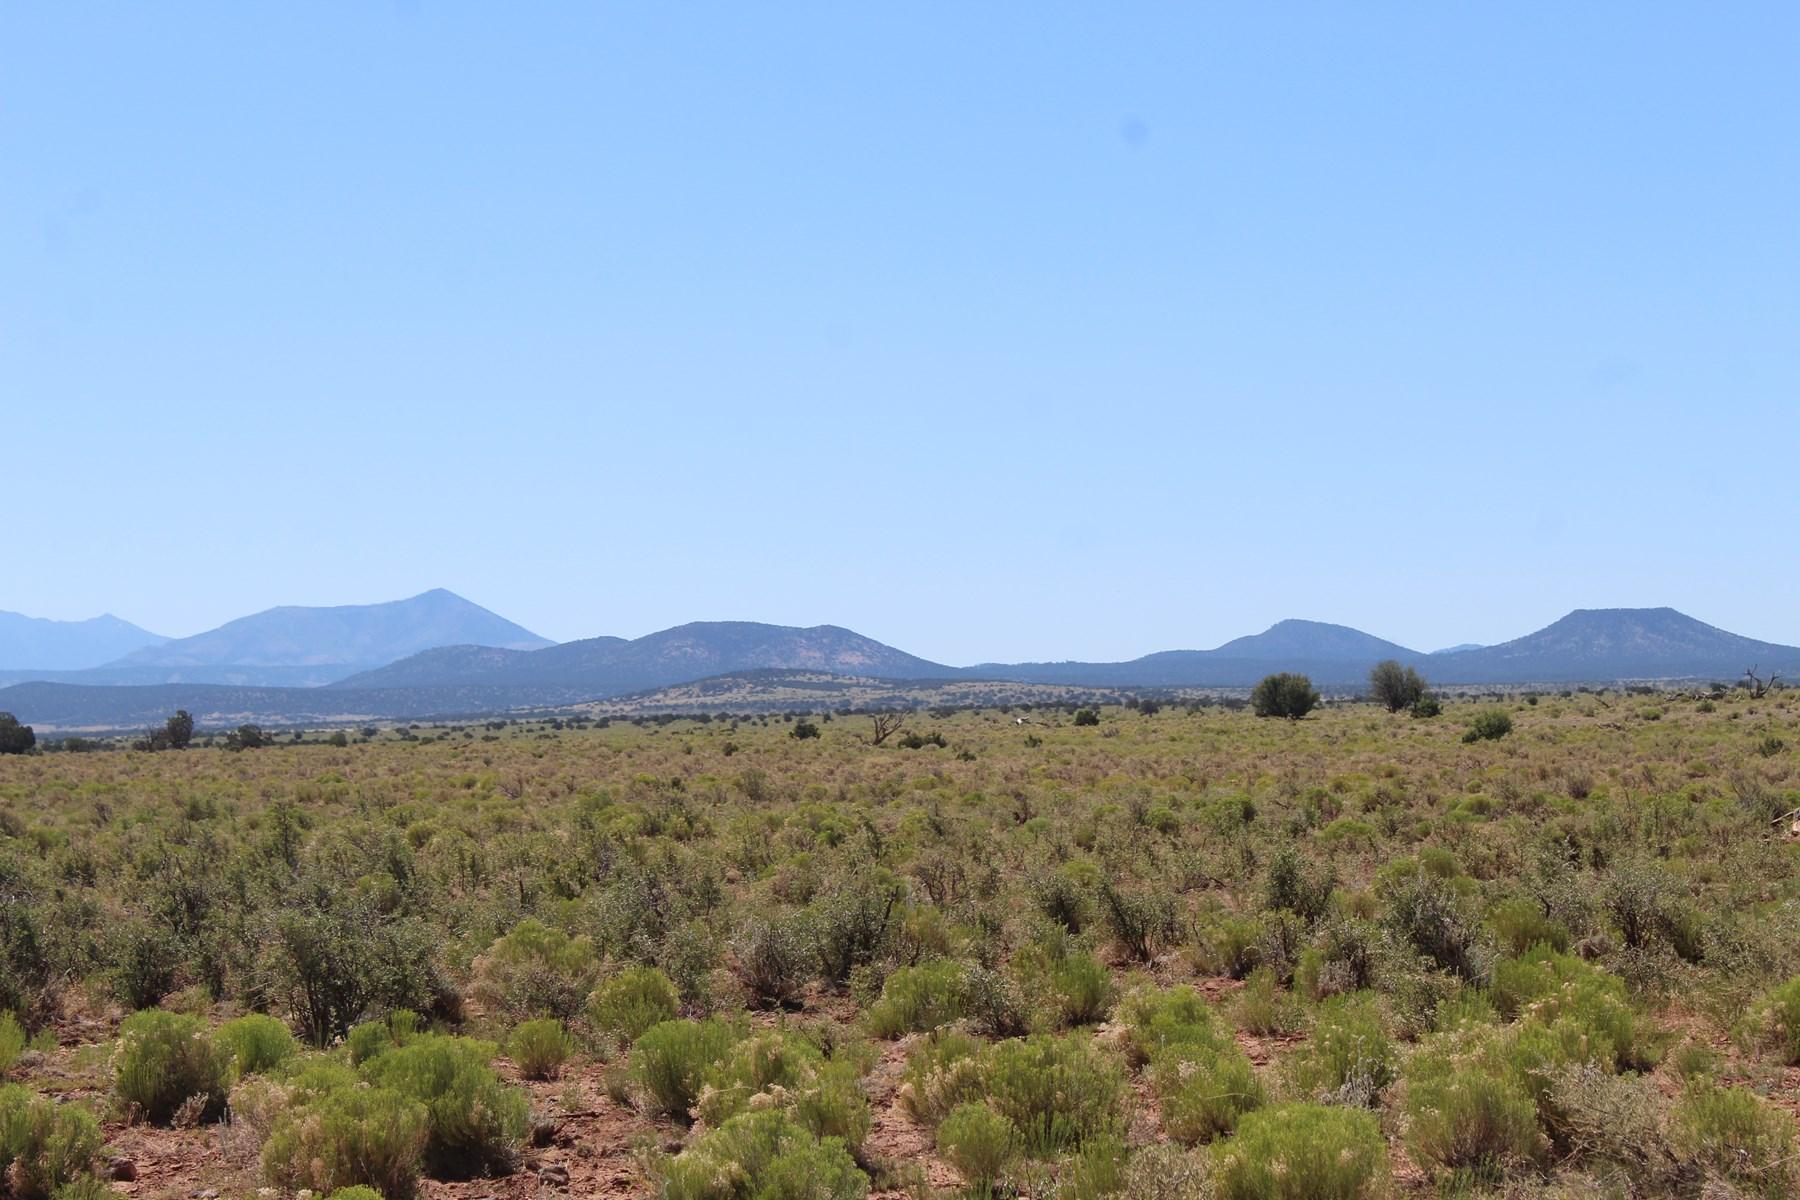 Recreational Land for Sale near Grand Canyon Arizona